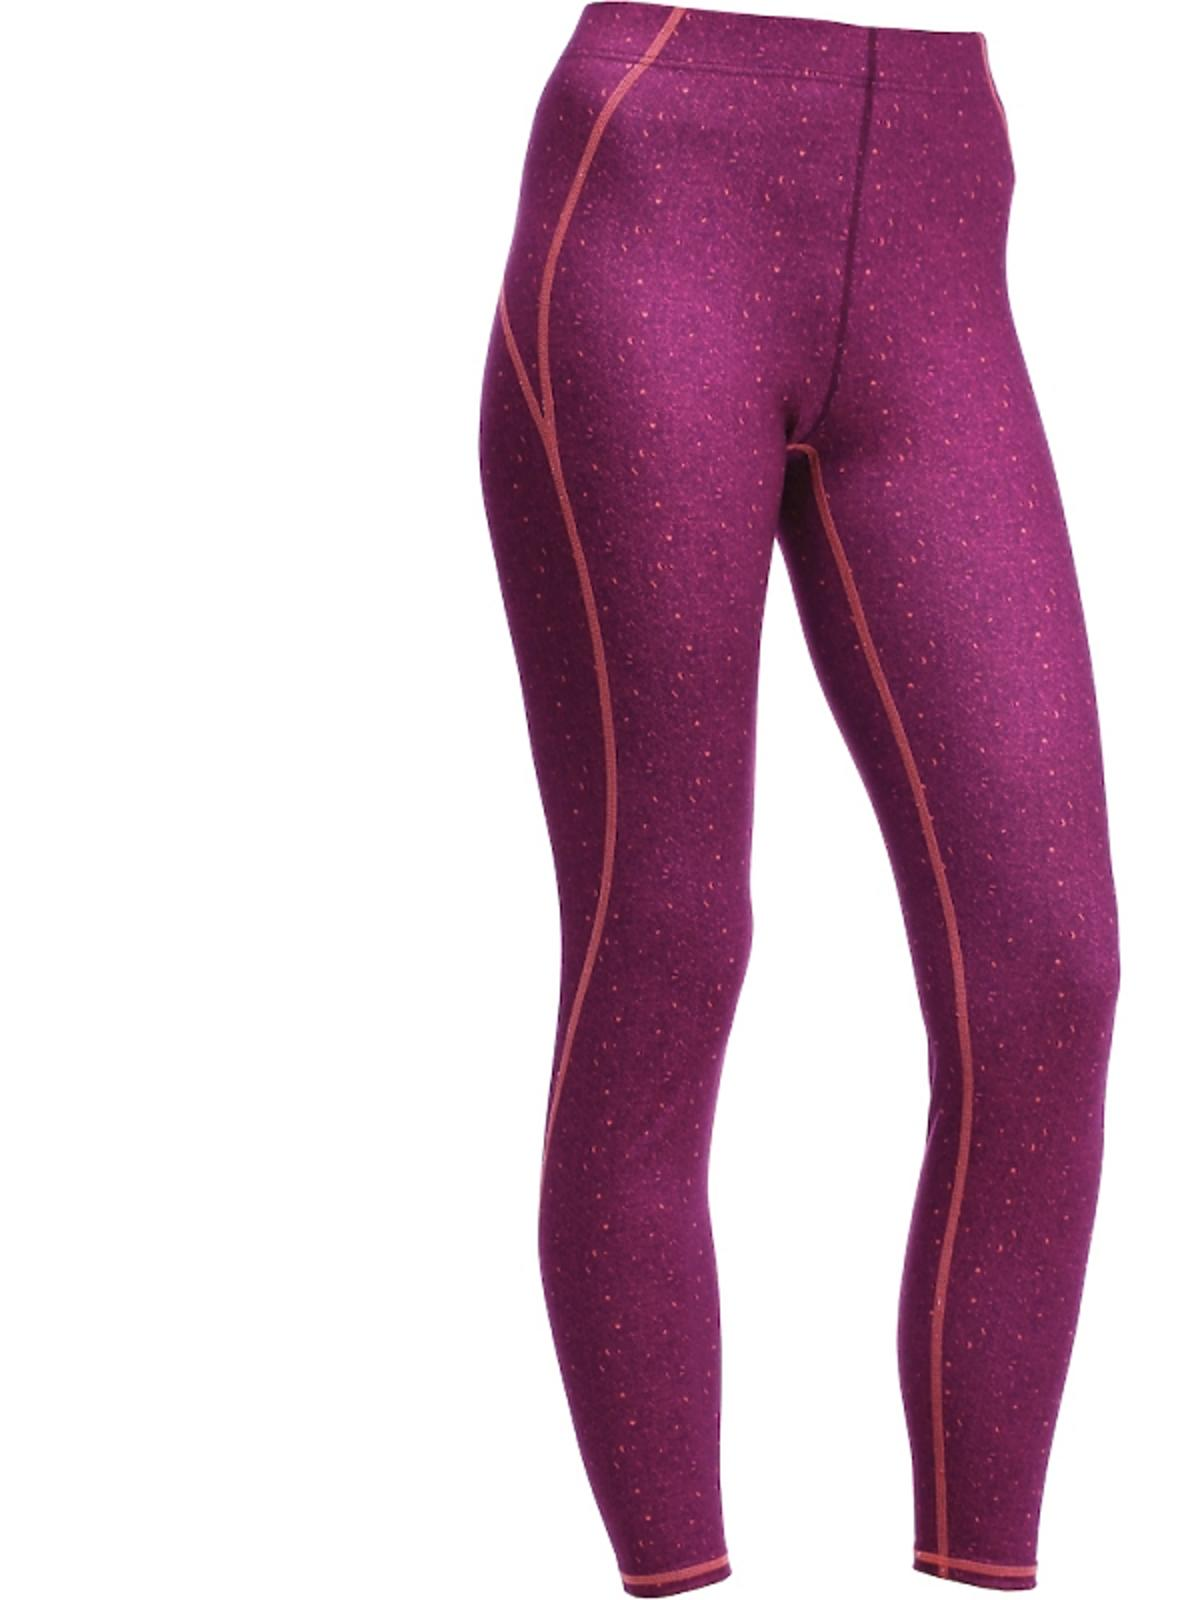 Fioletowe legginsy w kropki